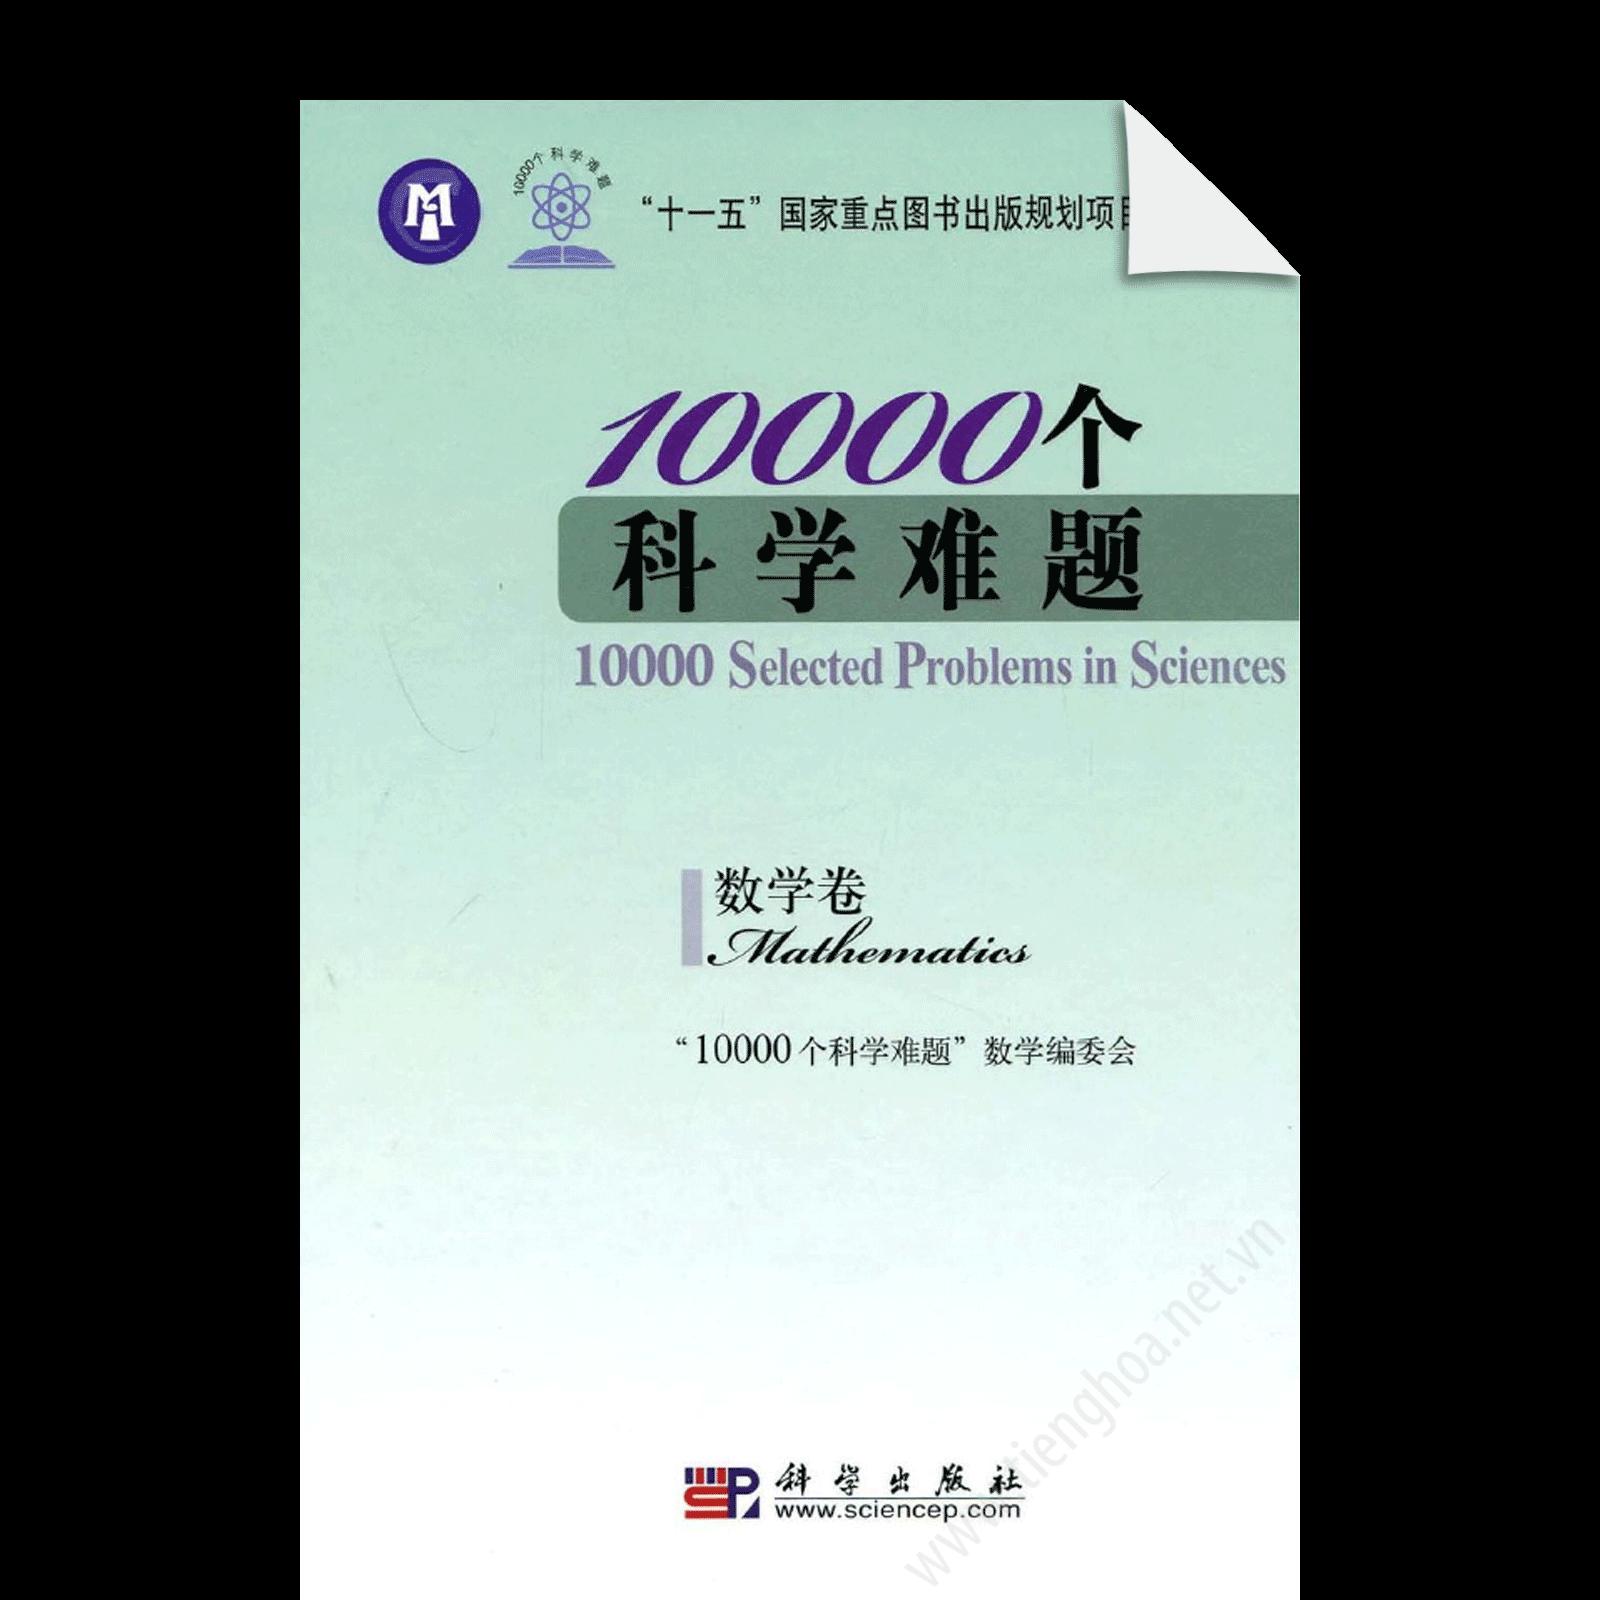 10000Ge Kexue Nanti Shuxuejuan